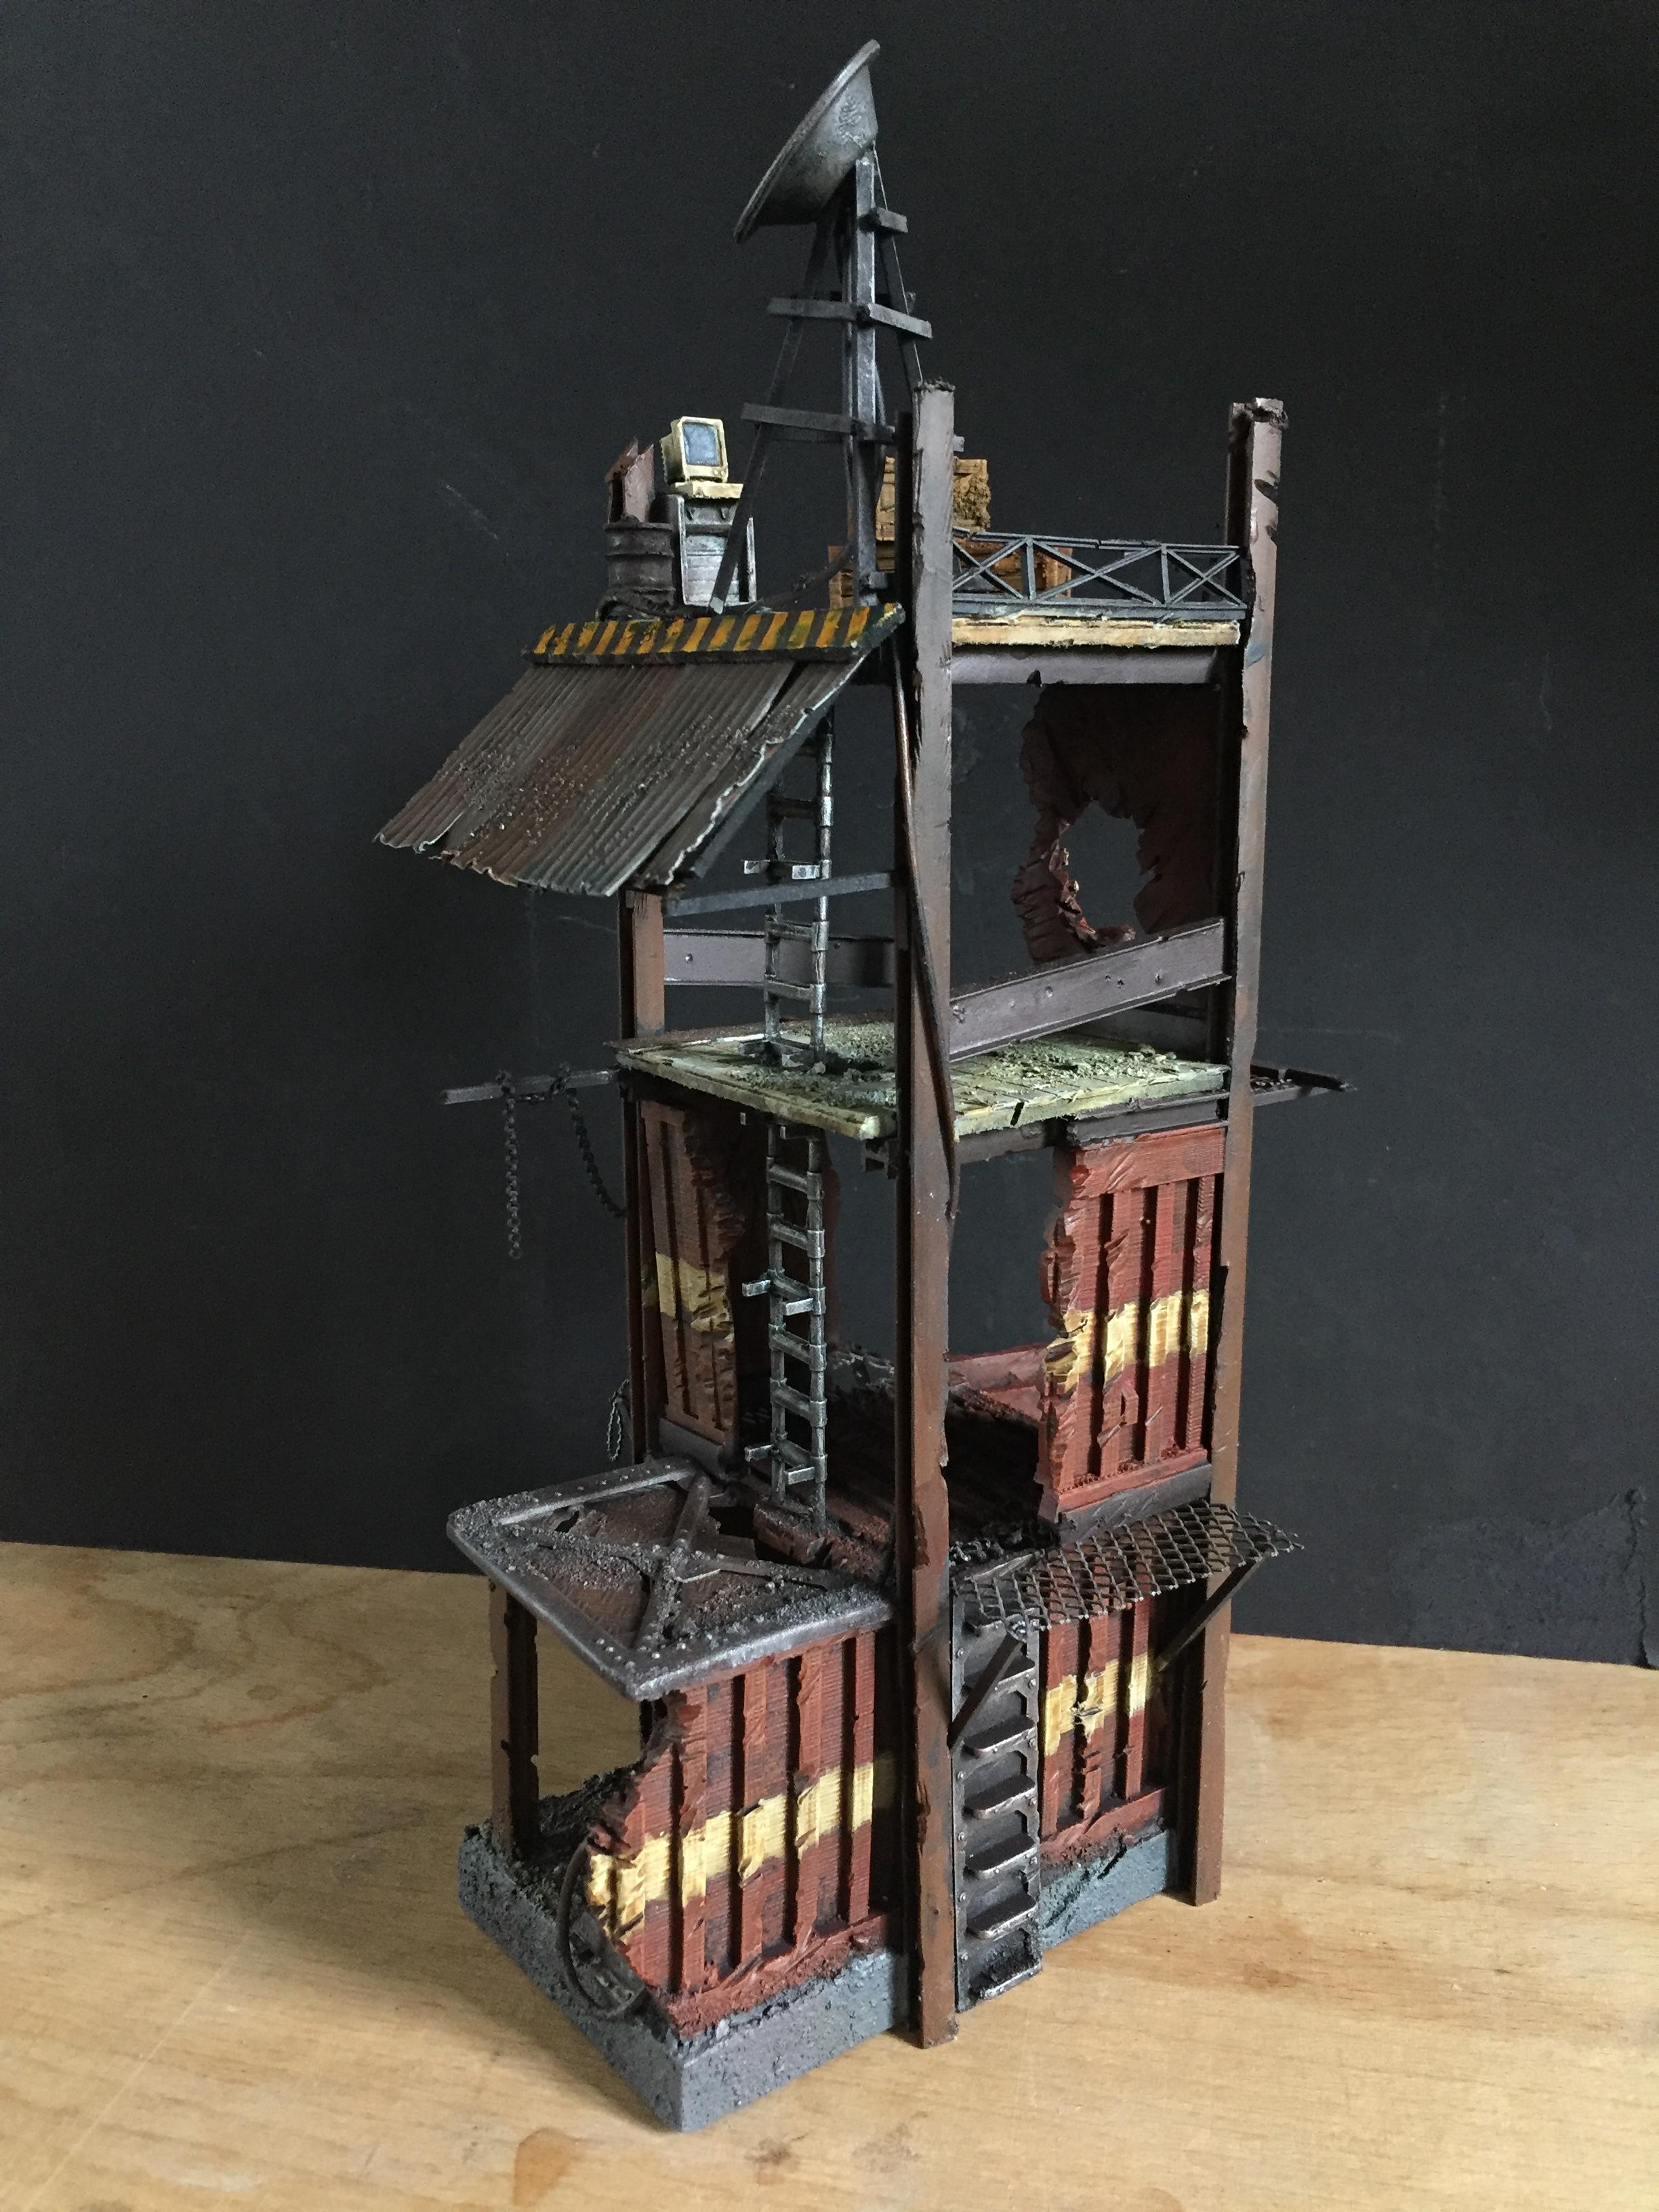 40k Scenery, 40k Terrain, Inq28, Inquisimunda, Necromunda, Necromunda Scenery, Necromunda Terrain, Terrain, Wargame, Warhammer 40,000, Warhammer 40k Scenery, Warhammer 40k Terrain, Watchtower